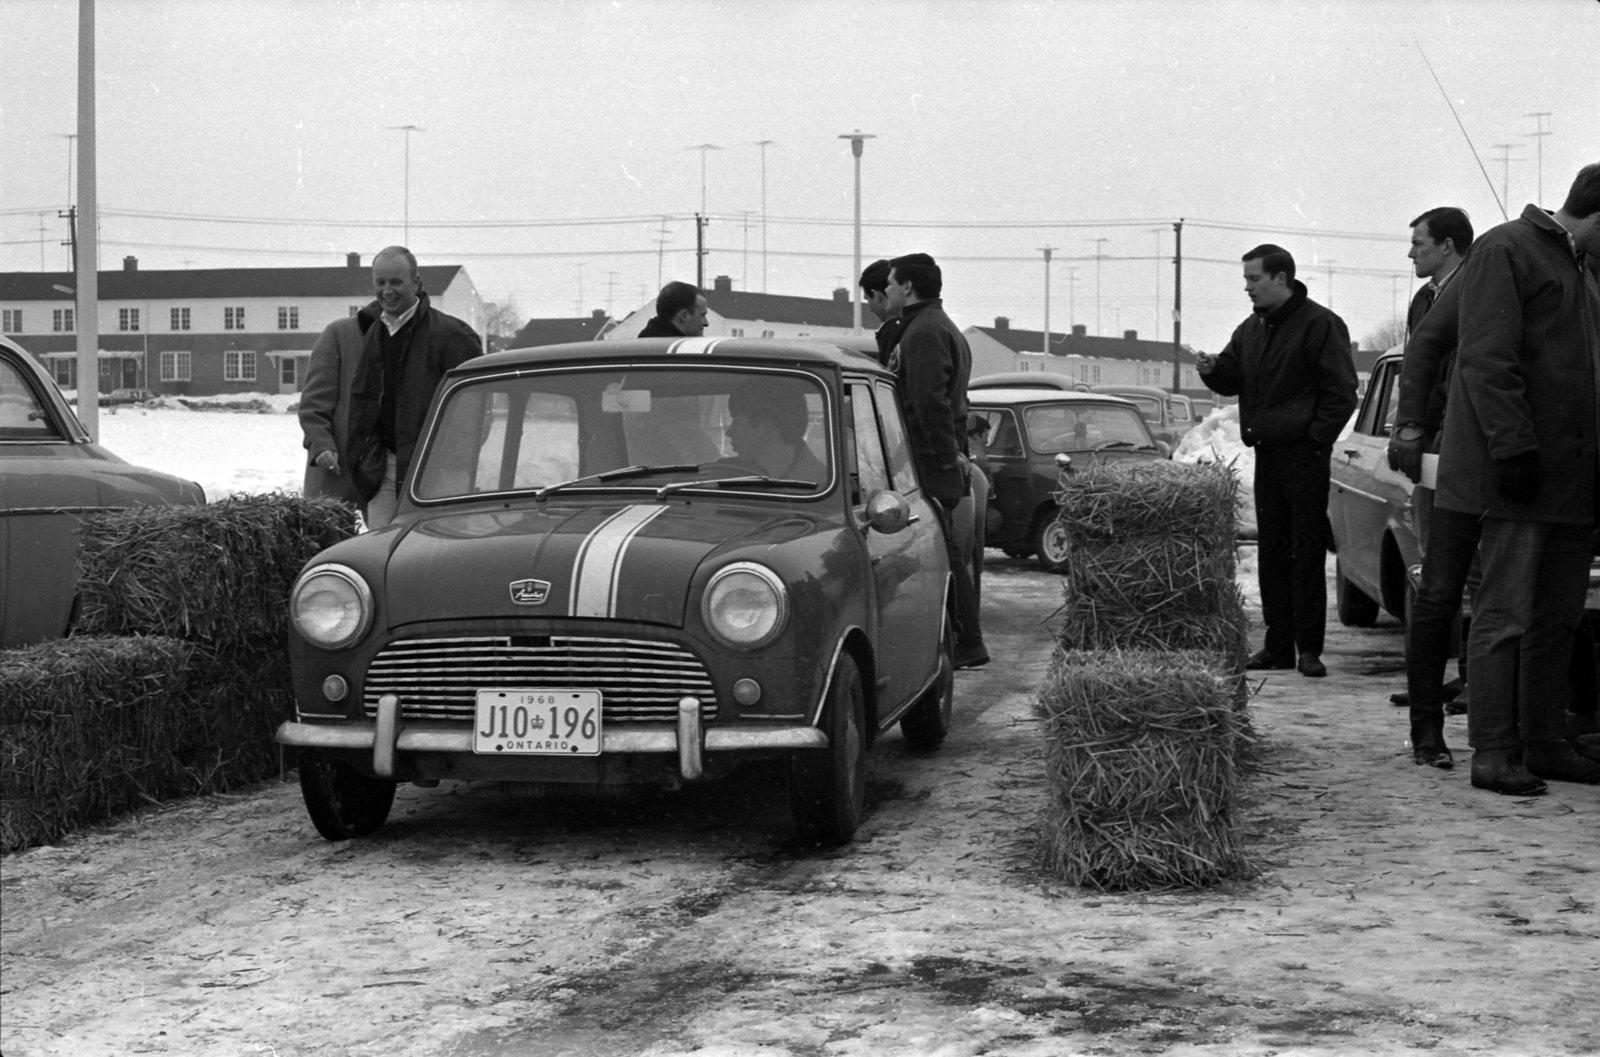 Waterloo Lutheran University Winter Carnival car rally, 1968